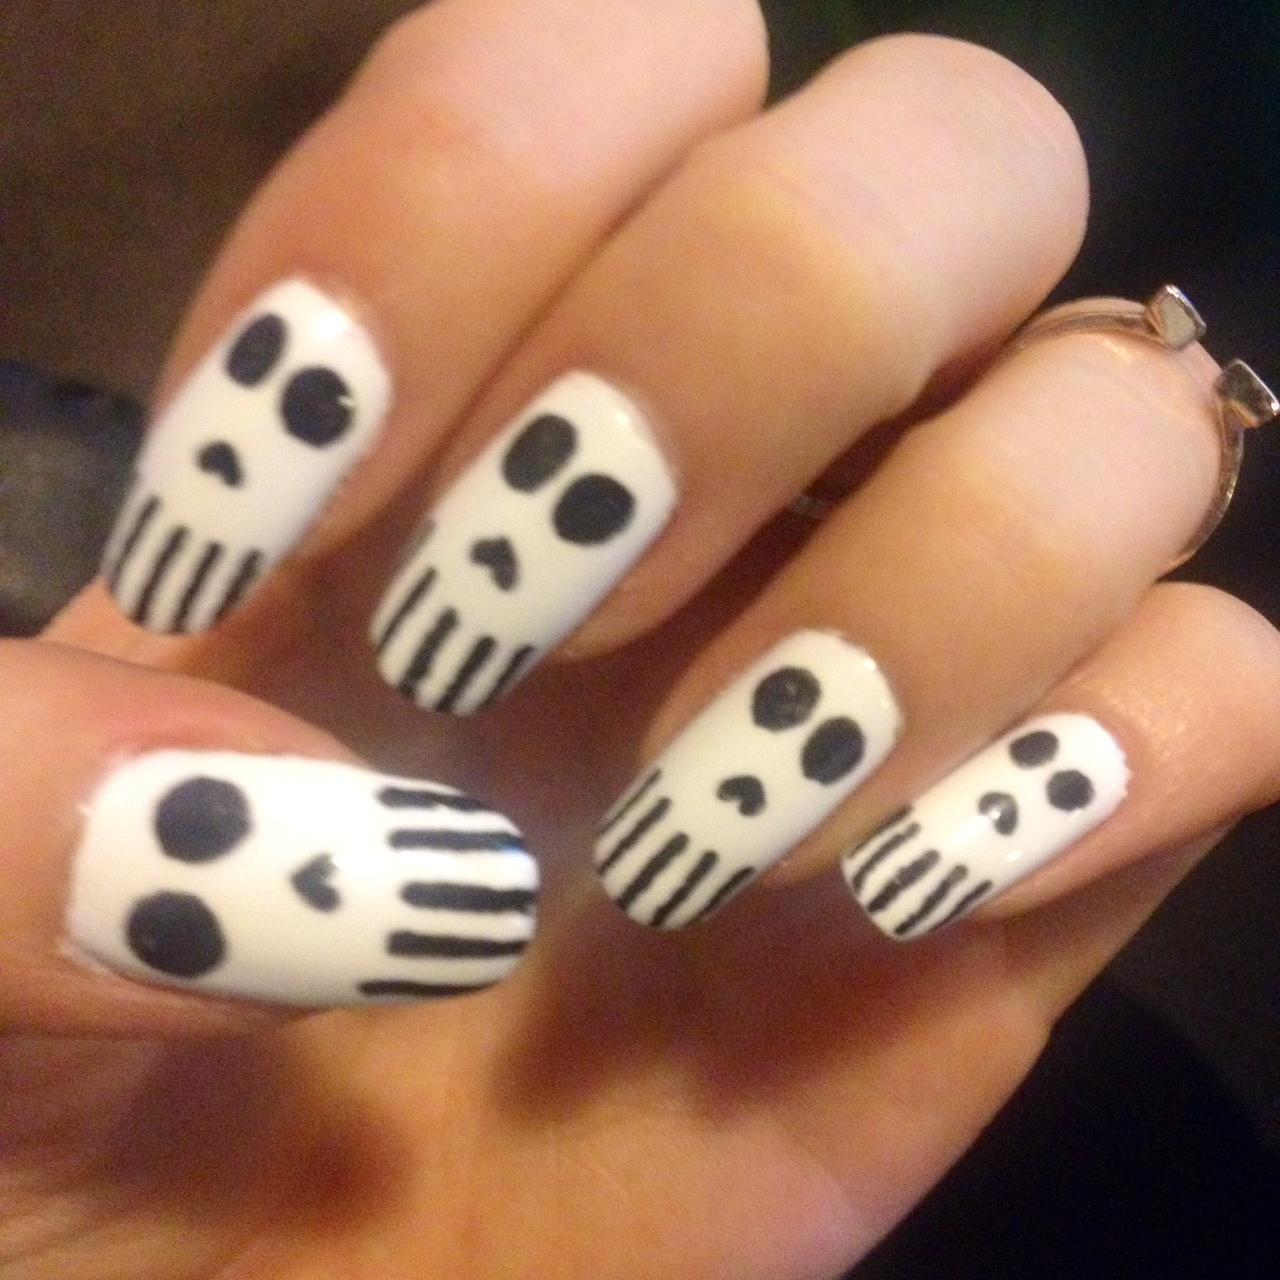 Halloween Nail Designs For Freaky Fingers | Richard Magazine